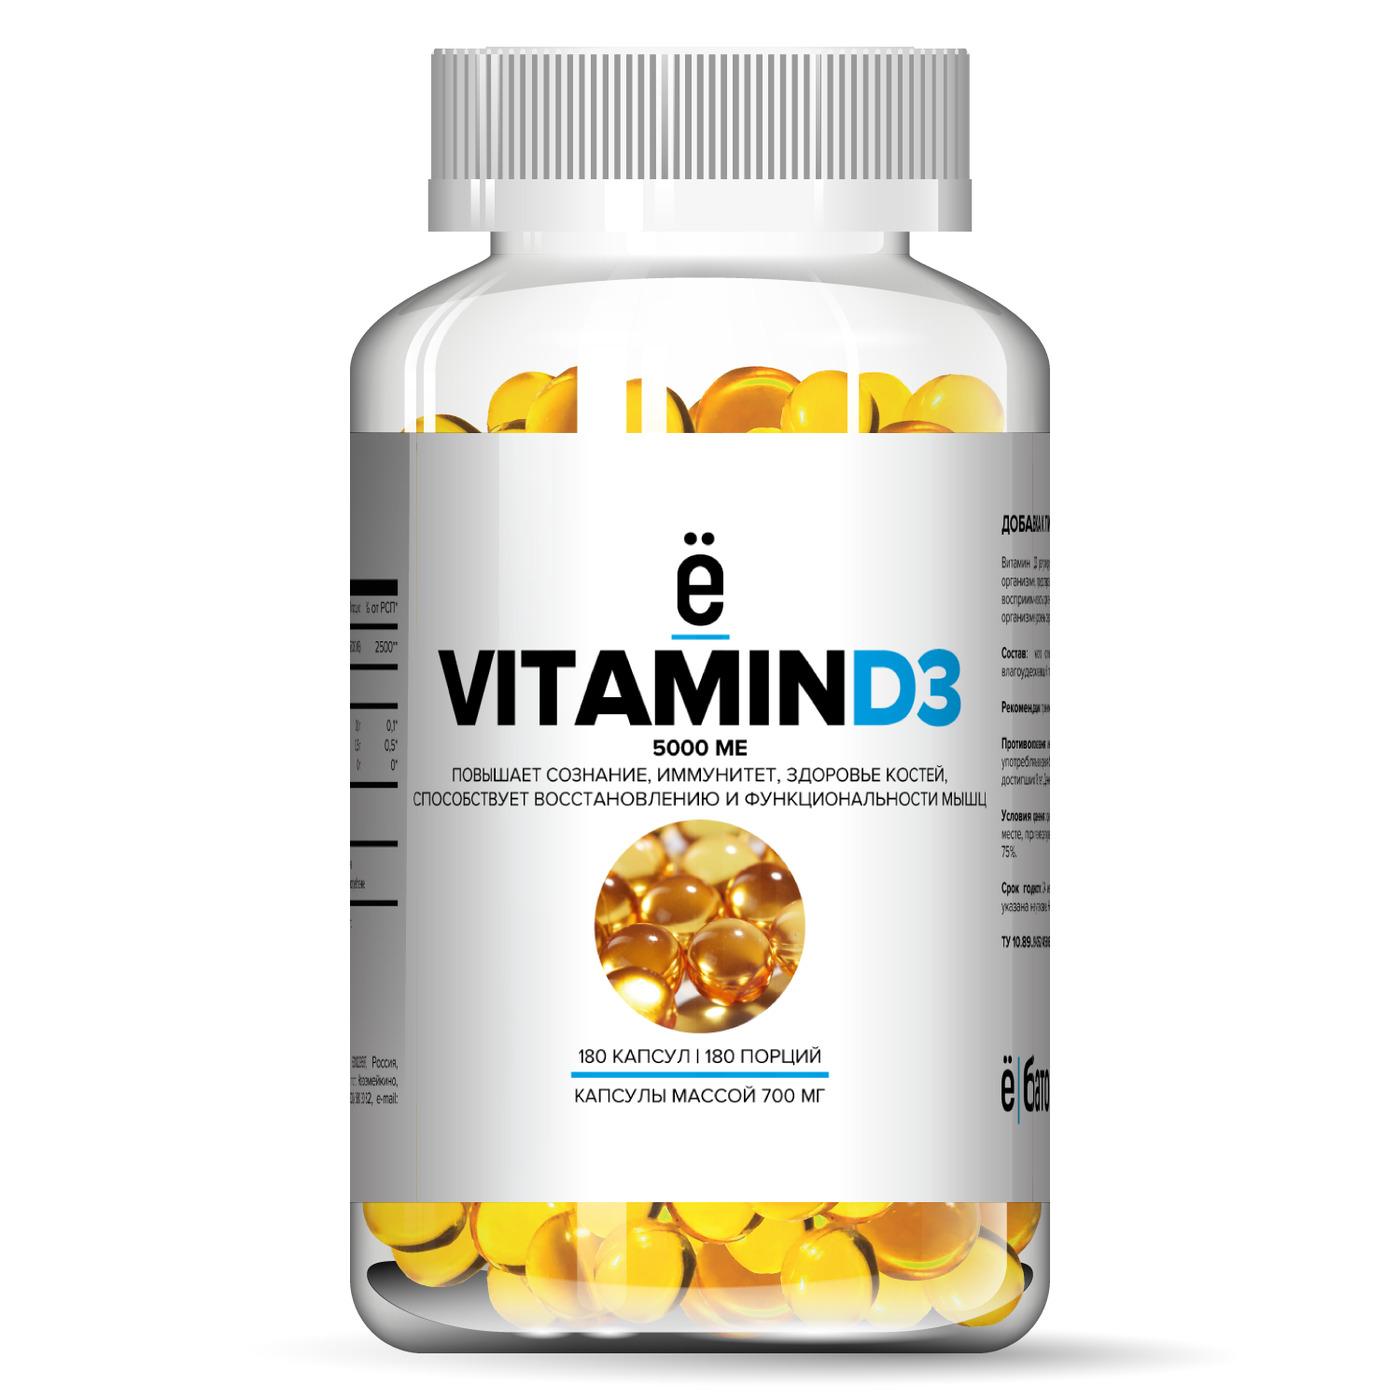 Купить Витамин Д3 ЁБАТОН Vitamin D3 5000ME 700 мг капсулы 180 шт.